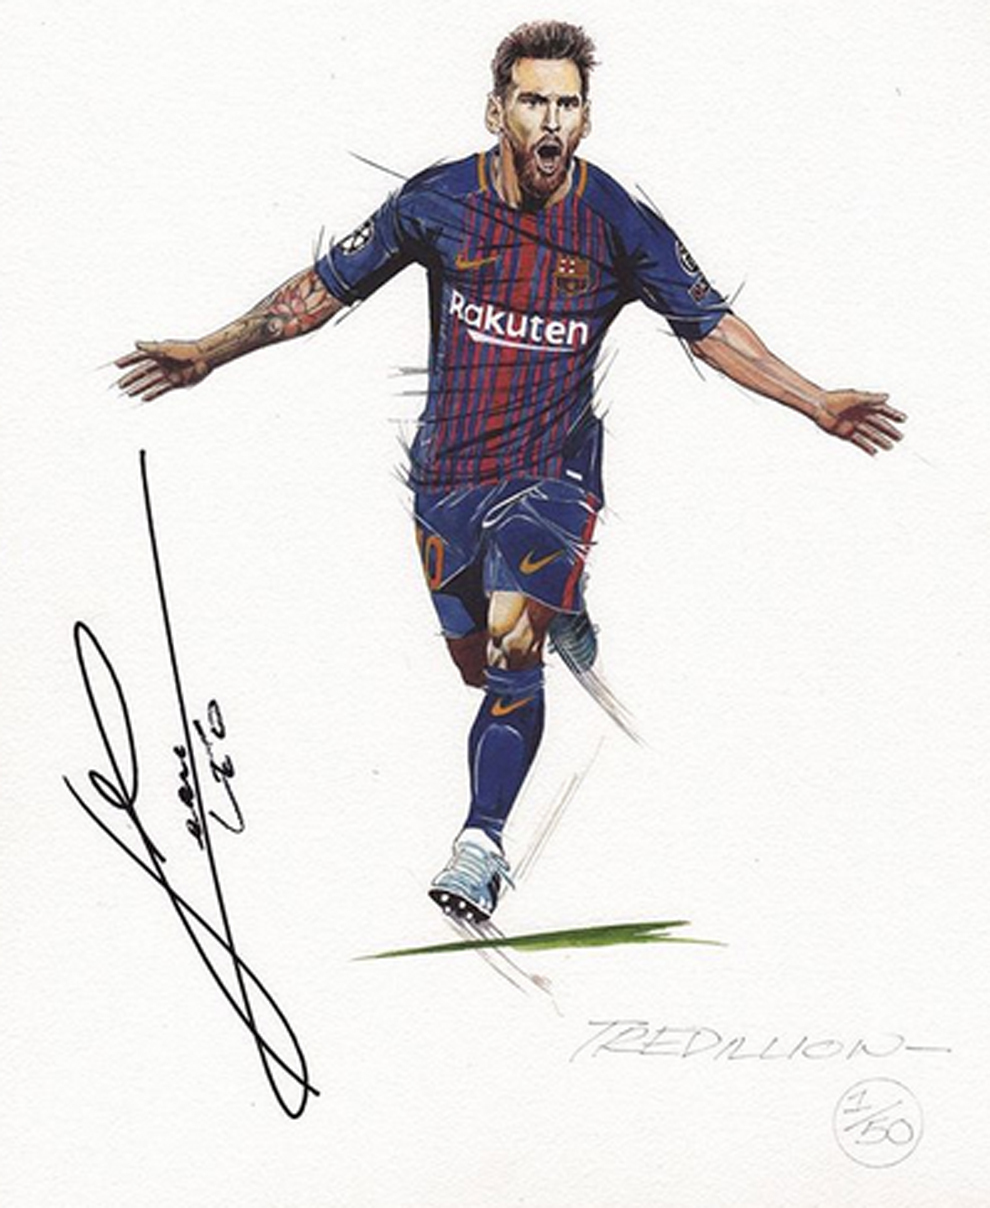 Espectacular dibujo de Leo Messi del famoso Paul Trevillion